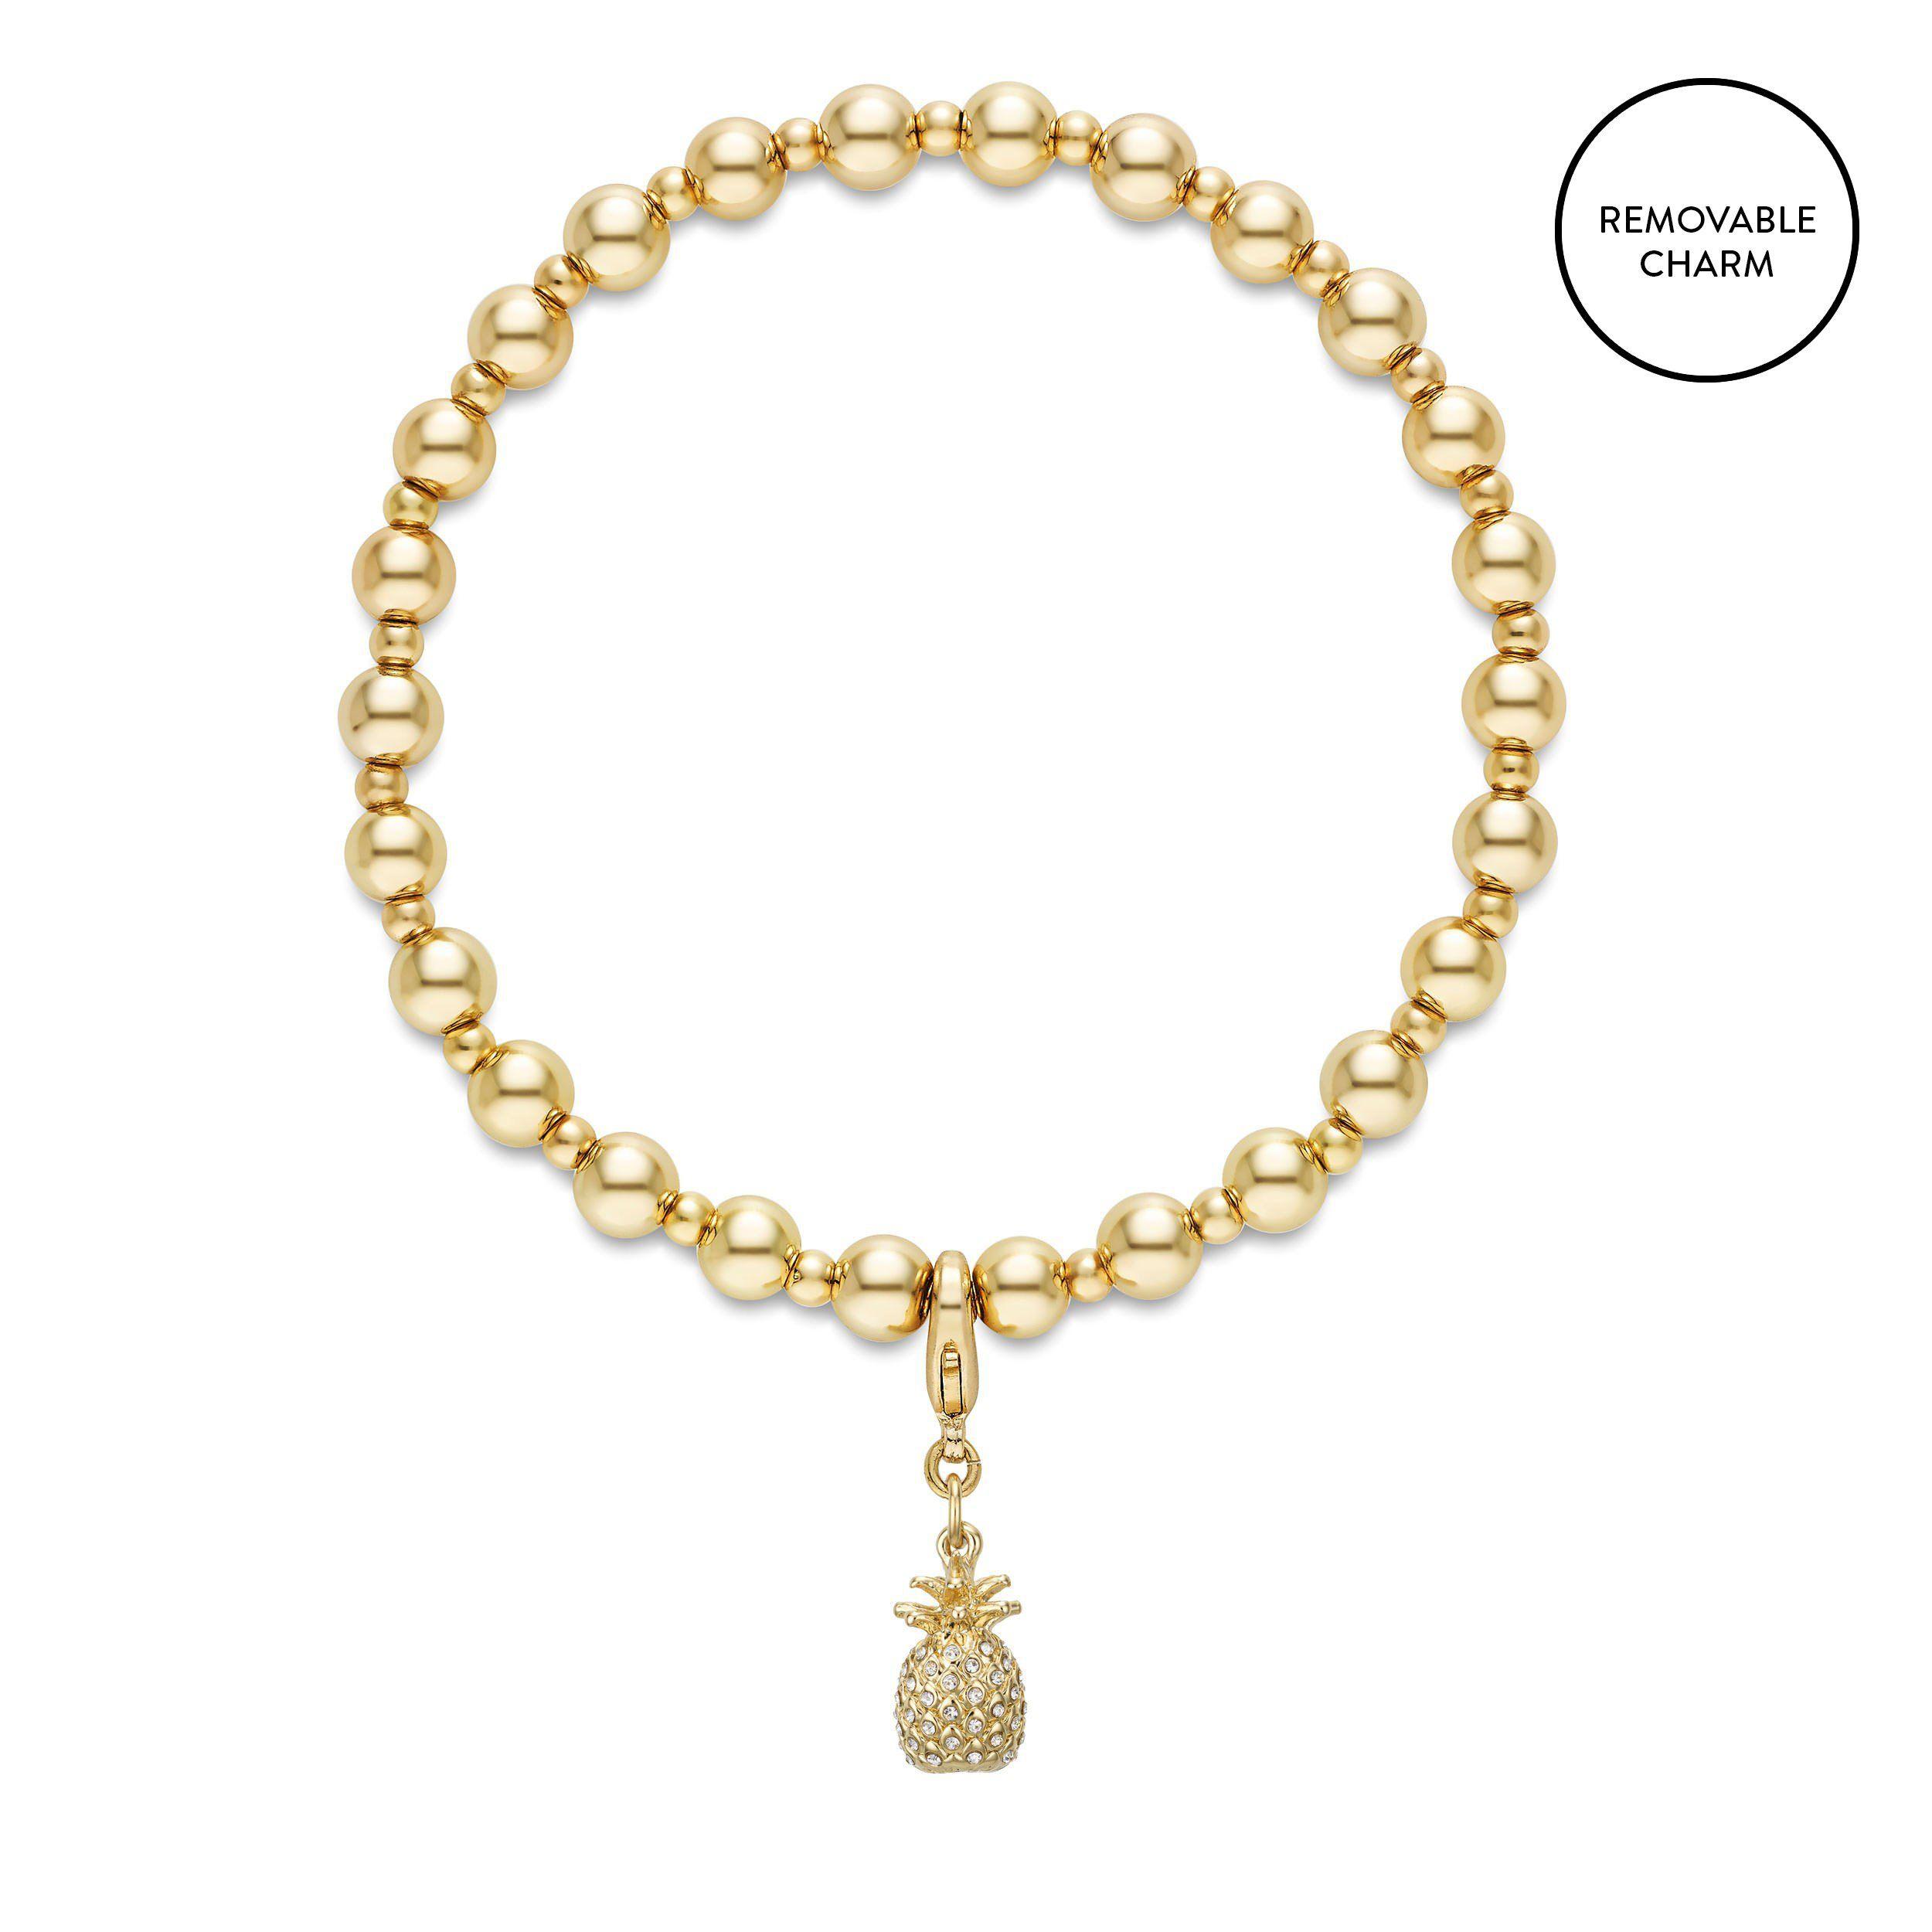 Buckley London Pineapple Charm Beaded Bracelet